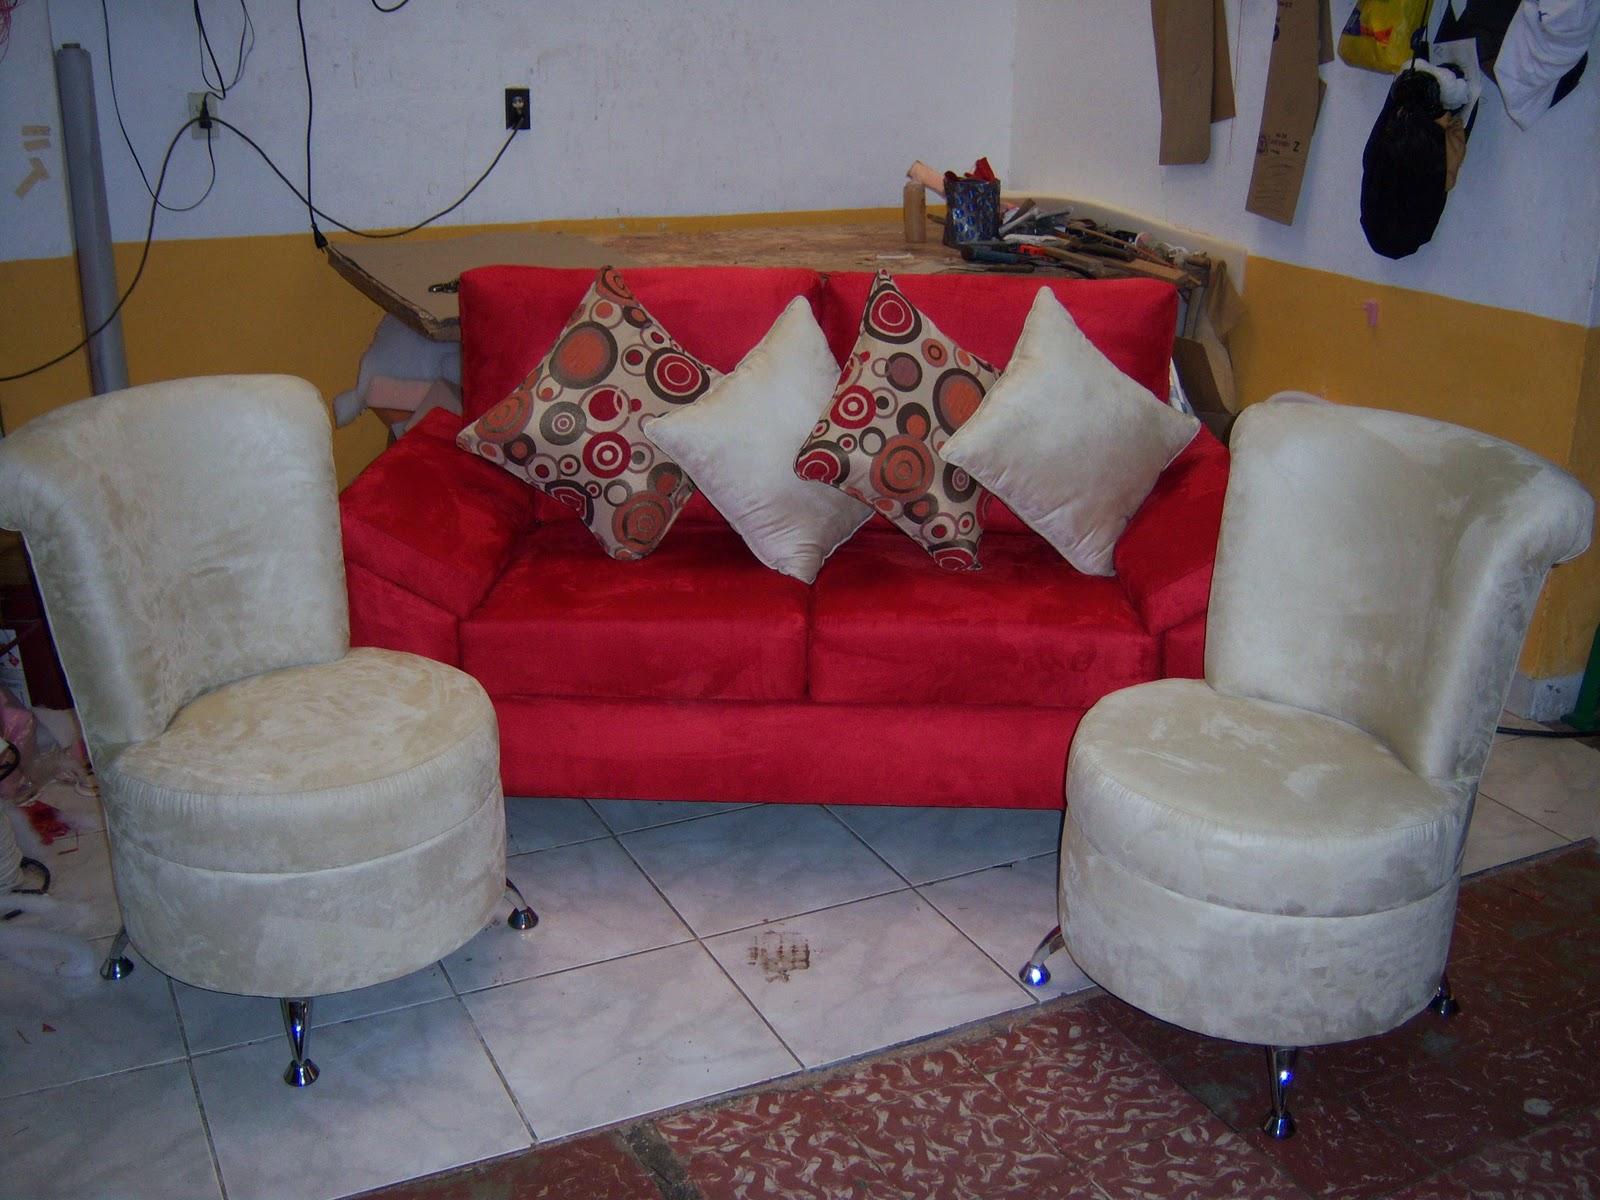 Colchones Muebles Anny 2010 # Muebles Puff Bucaramanga